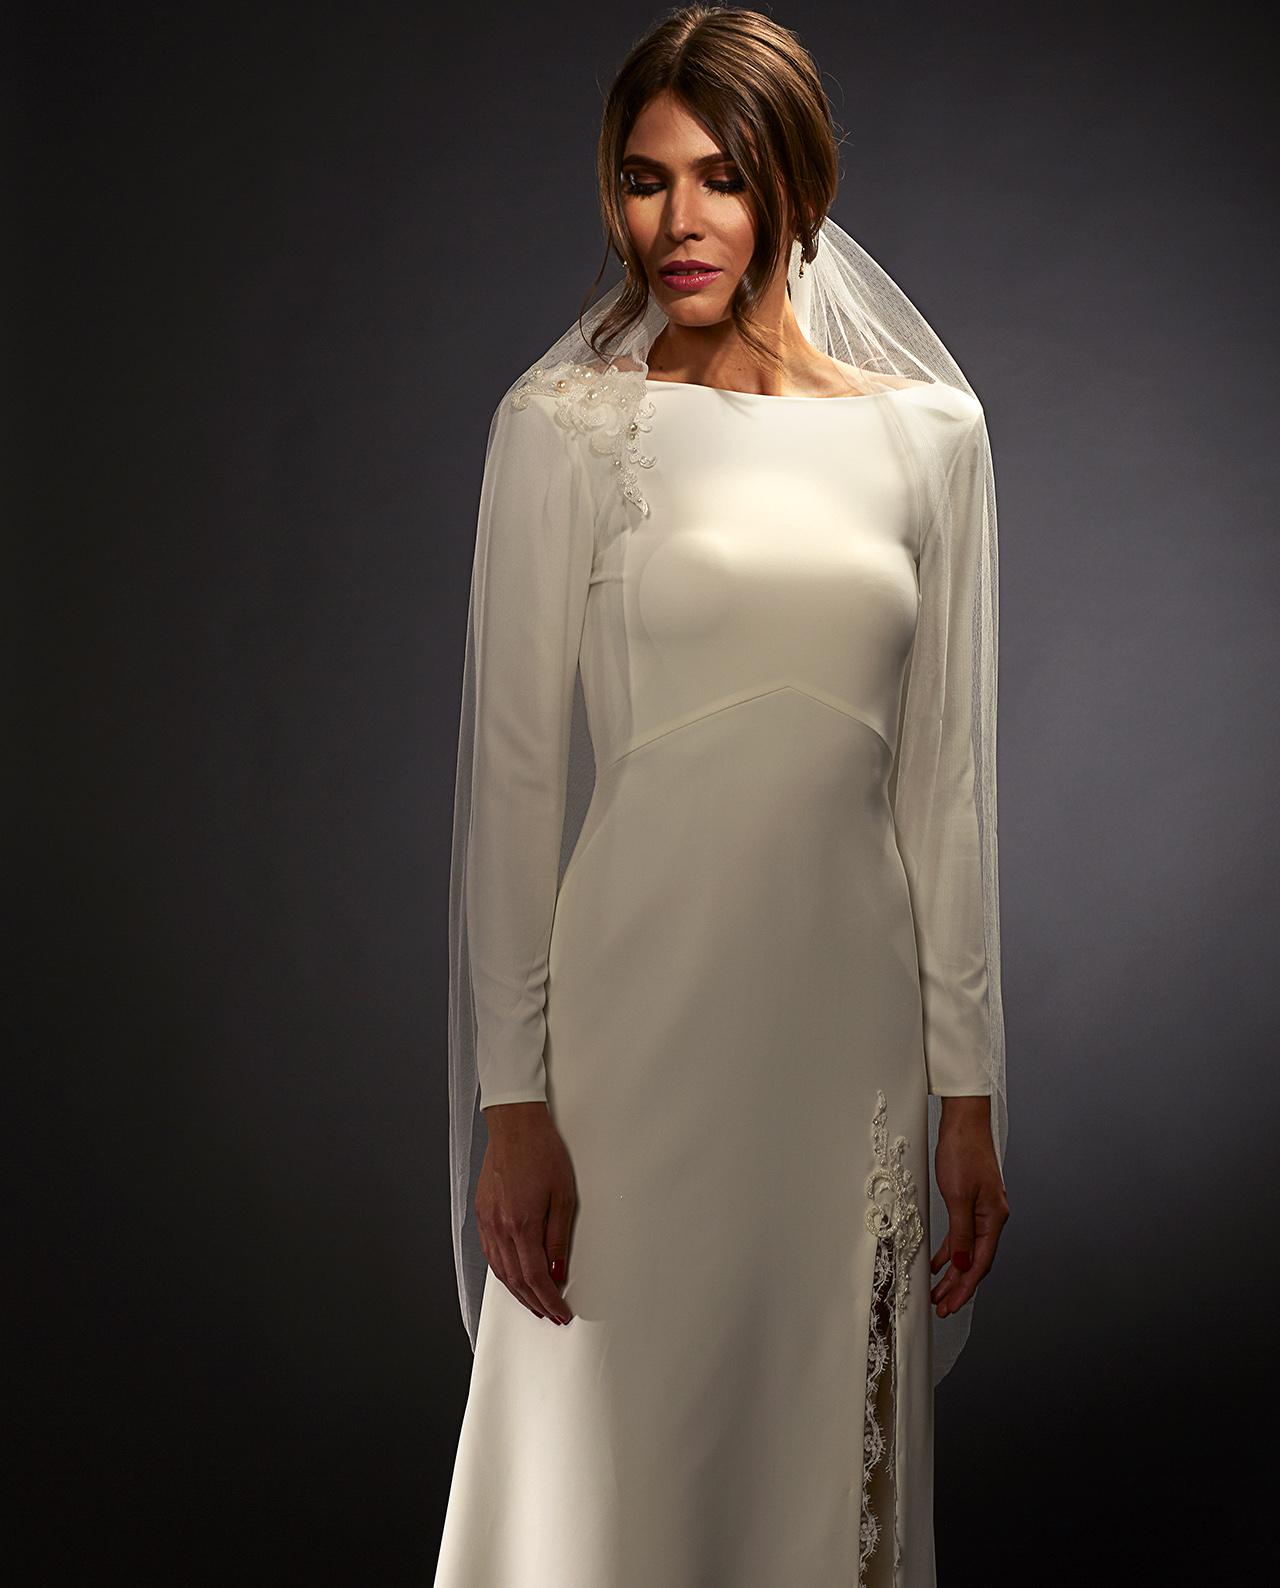 fe16a01cc334 Gardner wedding veil. Brudeslør. Brudetilbehør. Luxury Bridal Wear. Gudnitz  Copenhagen